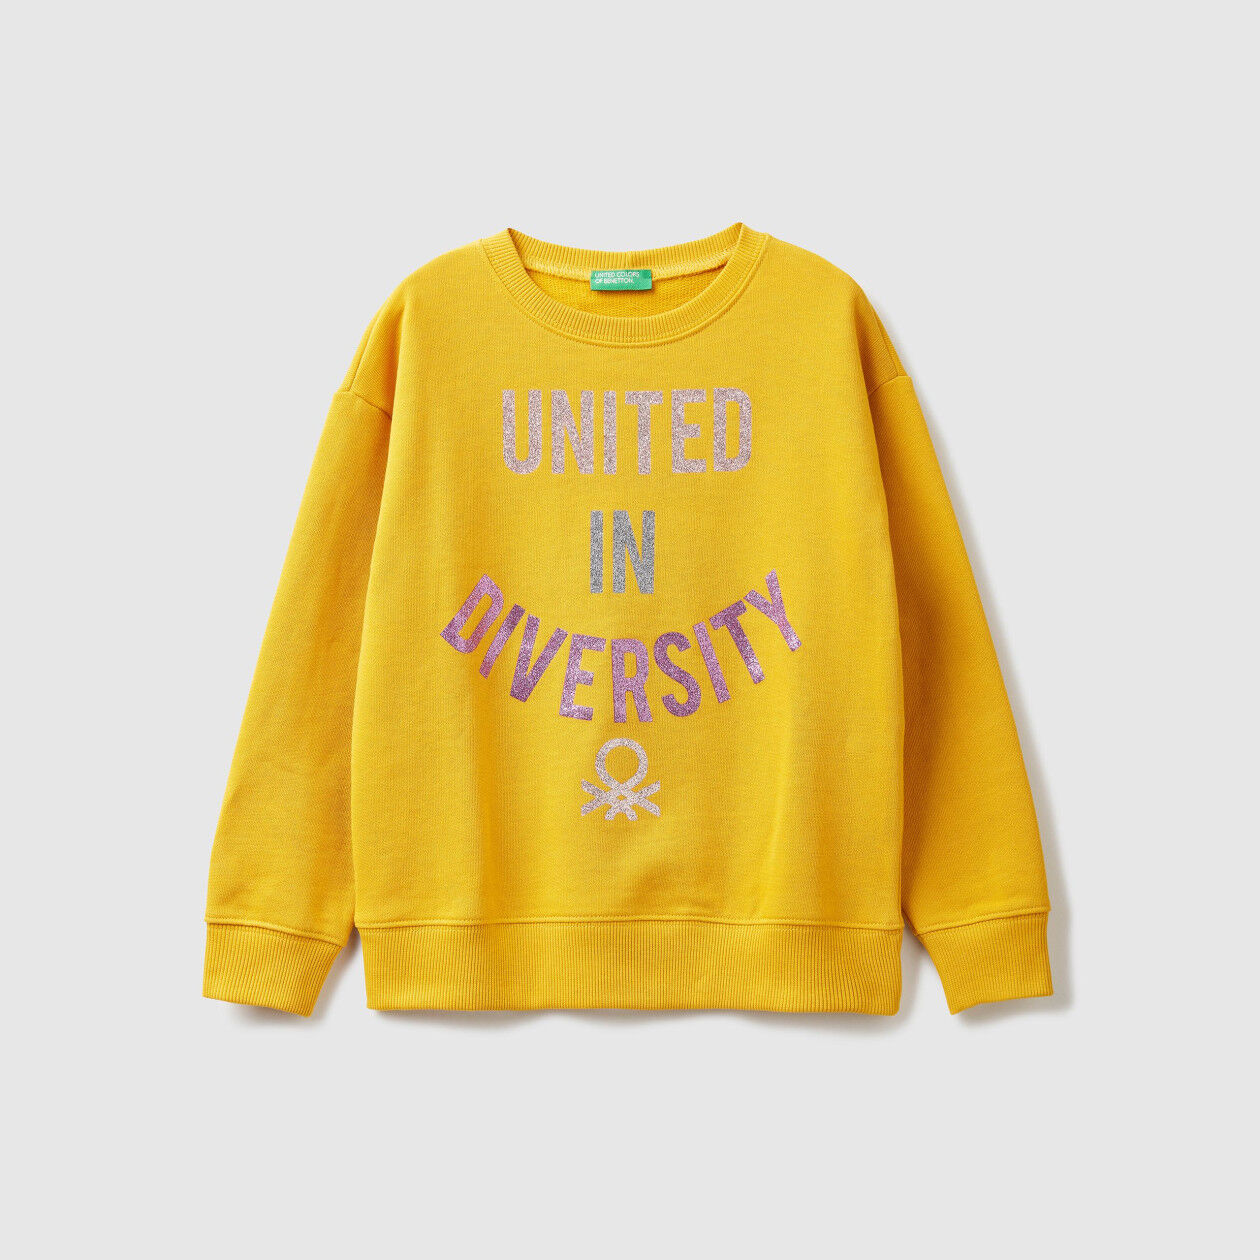 Crew neck sweatshirt with glittery print